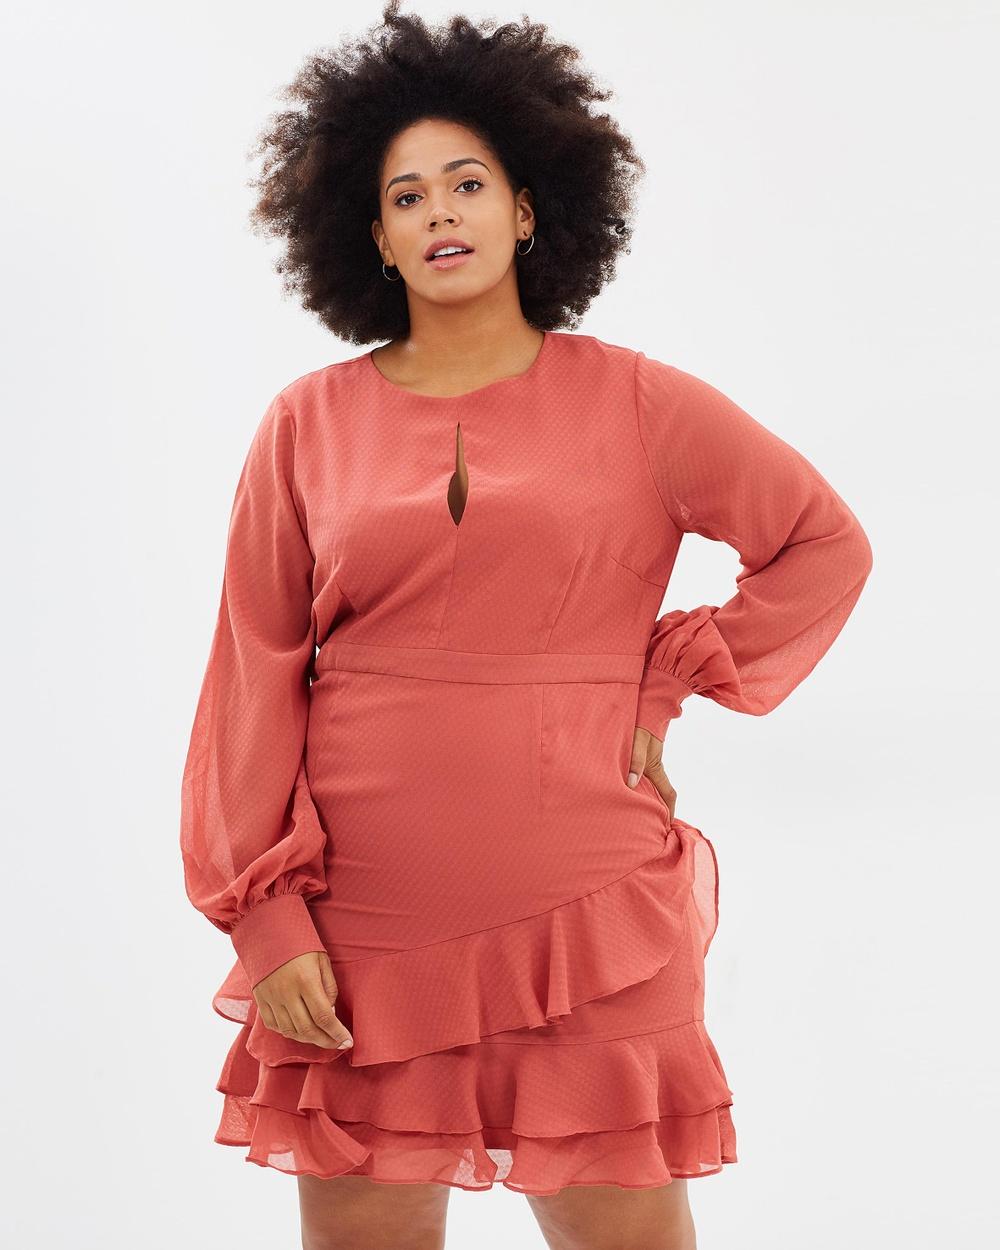 Cooper St CS CURVY Briar Rose Long Sleeve Dress Dresses Cinnamon Red CS CURVY Briar Rose Long Sleeve Dress